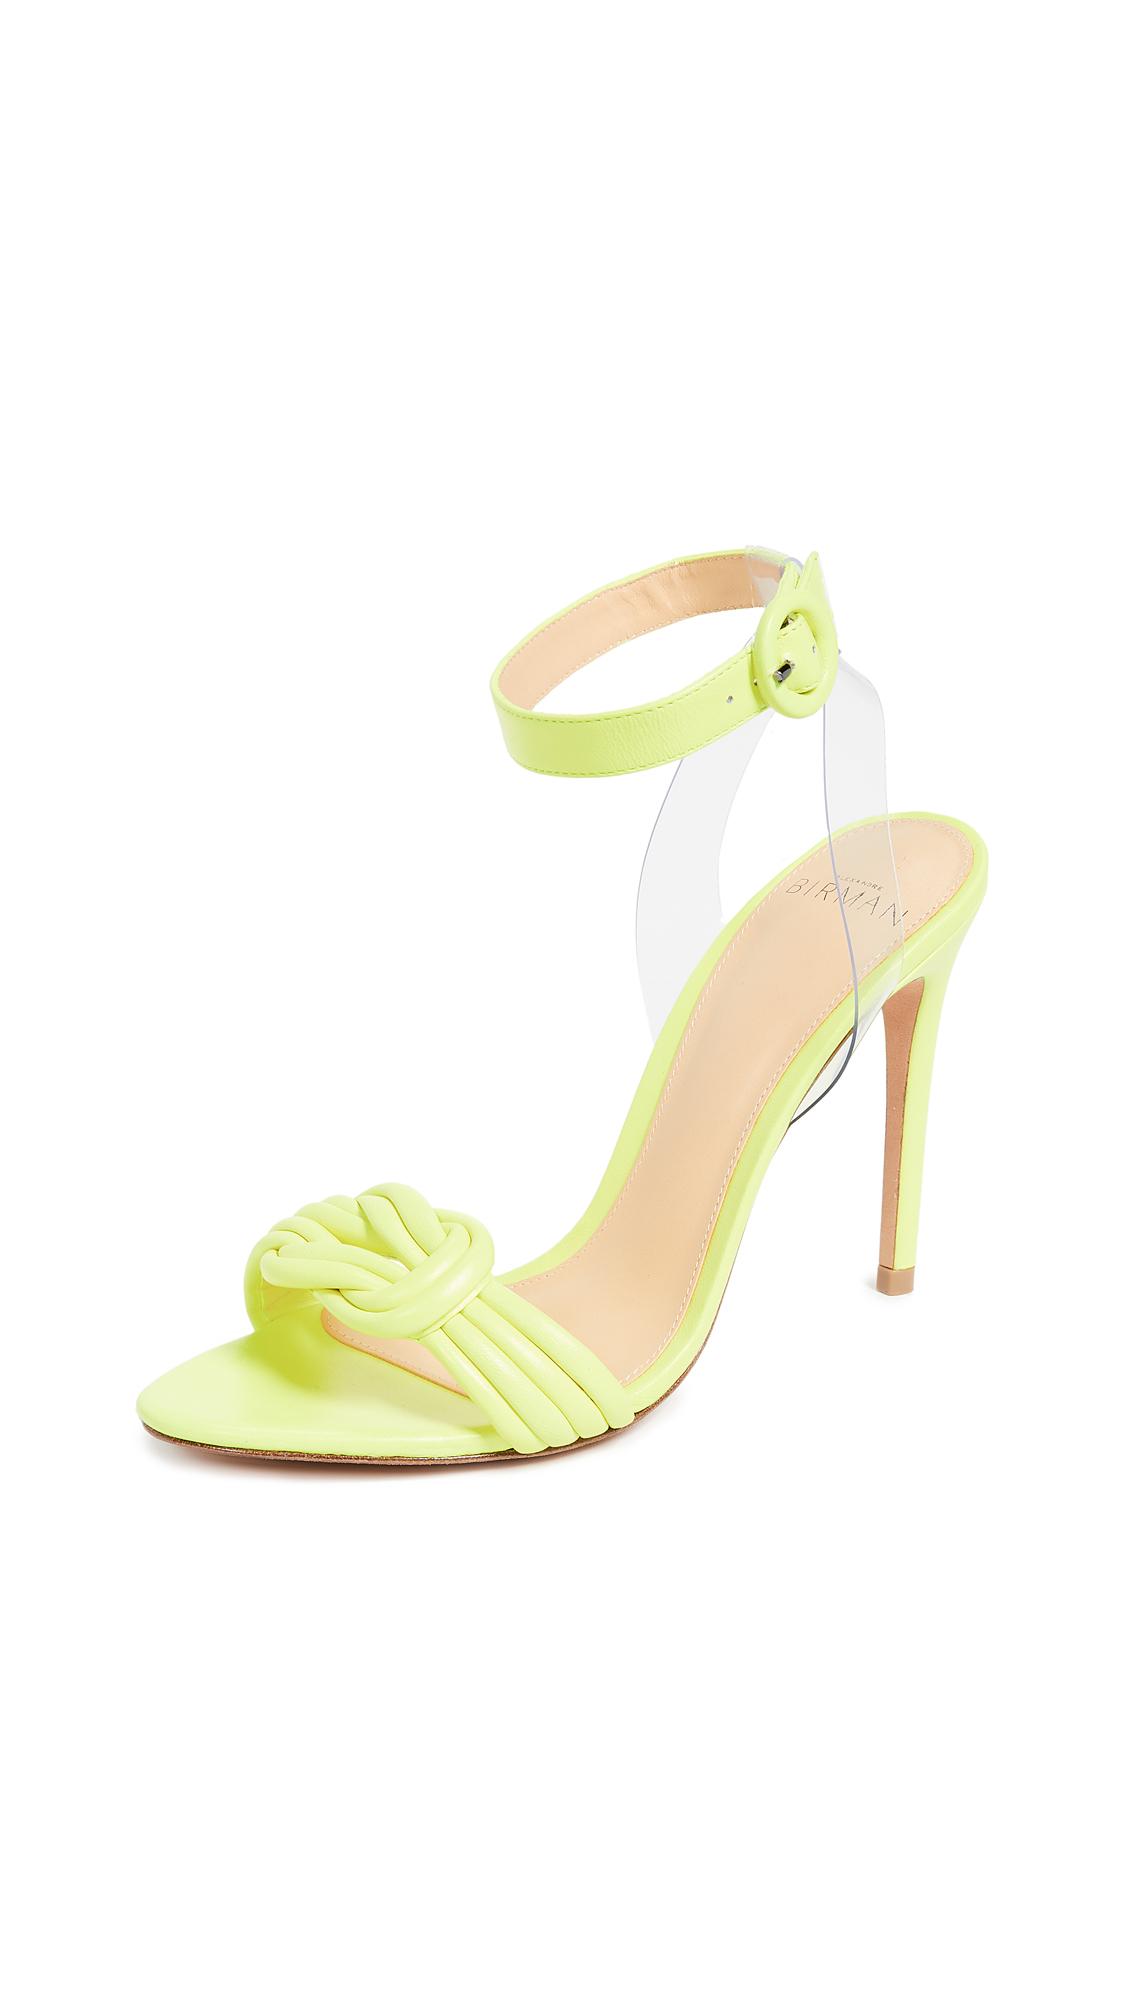 Alexandre Birman Vicky Vinyl 100mm Sandals - Yellow Fluo/Transparent